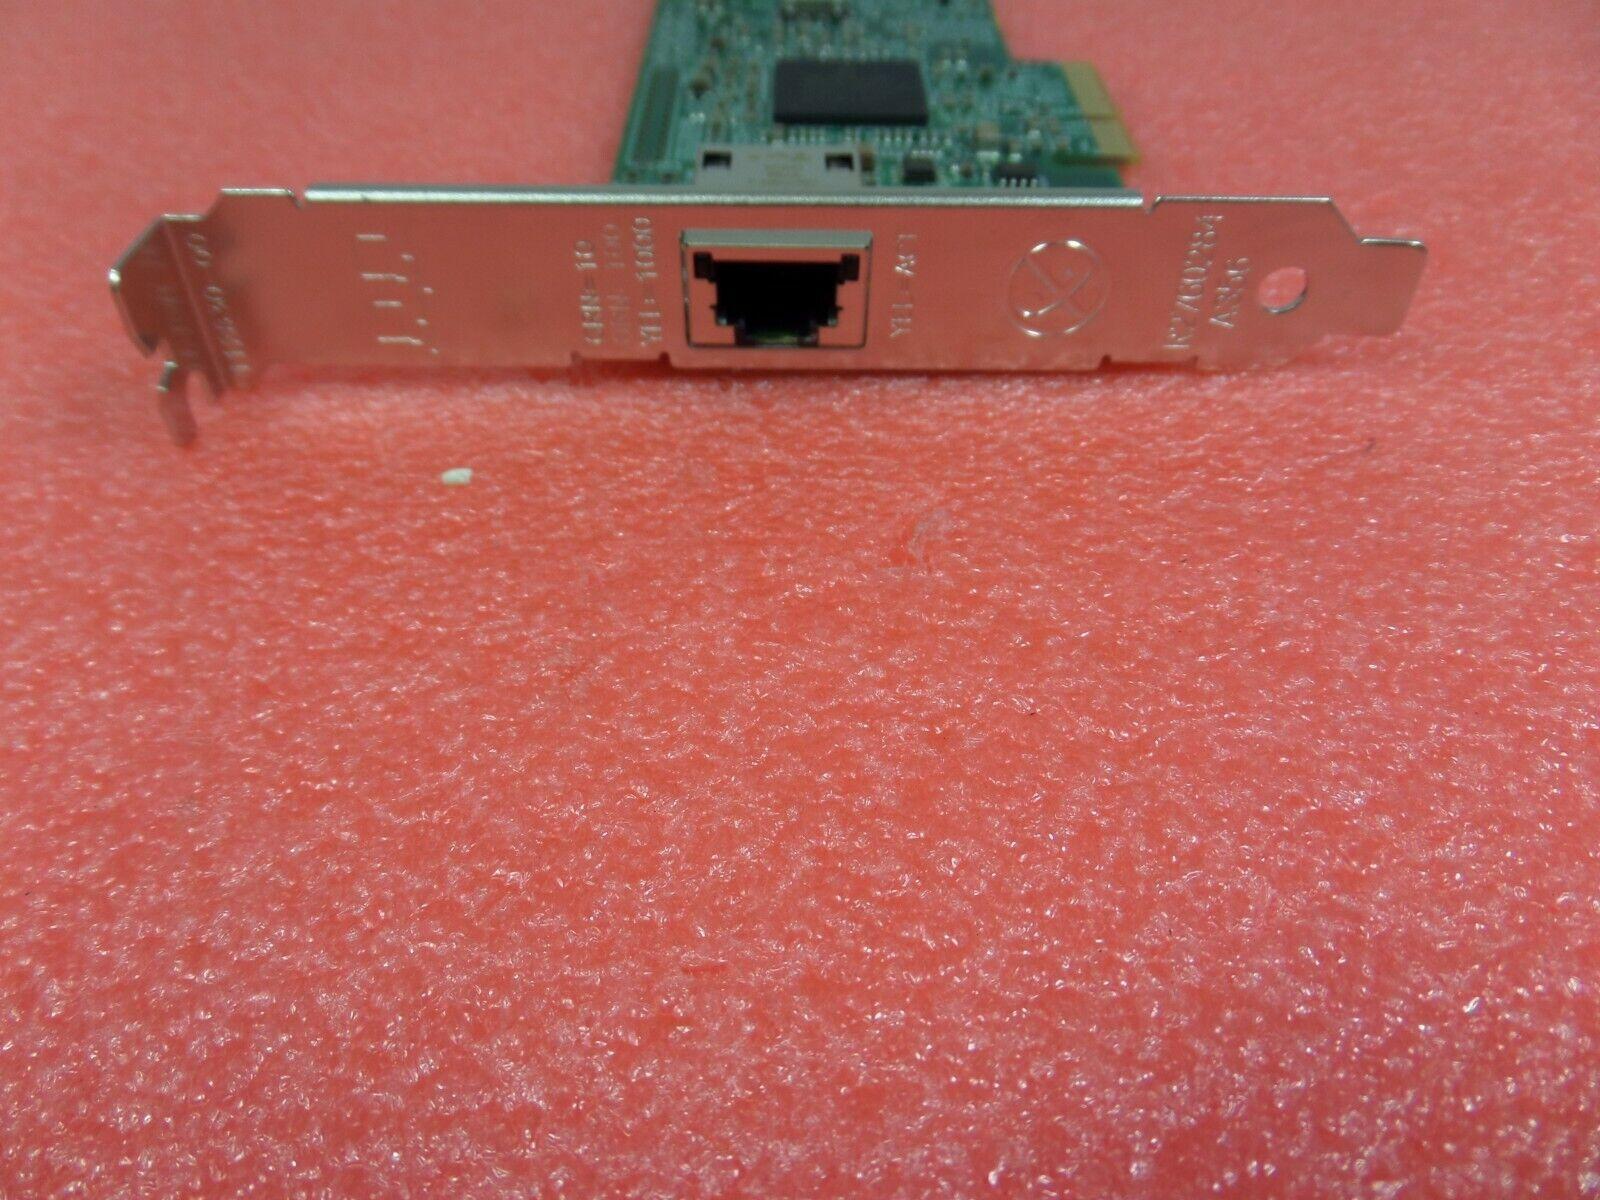 (6) Dell TX564 NIC-1020TIB2/B8 Broadcom Pro1000 Single Port Network Adapter Card